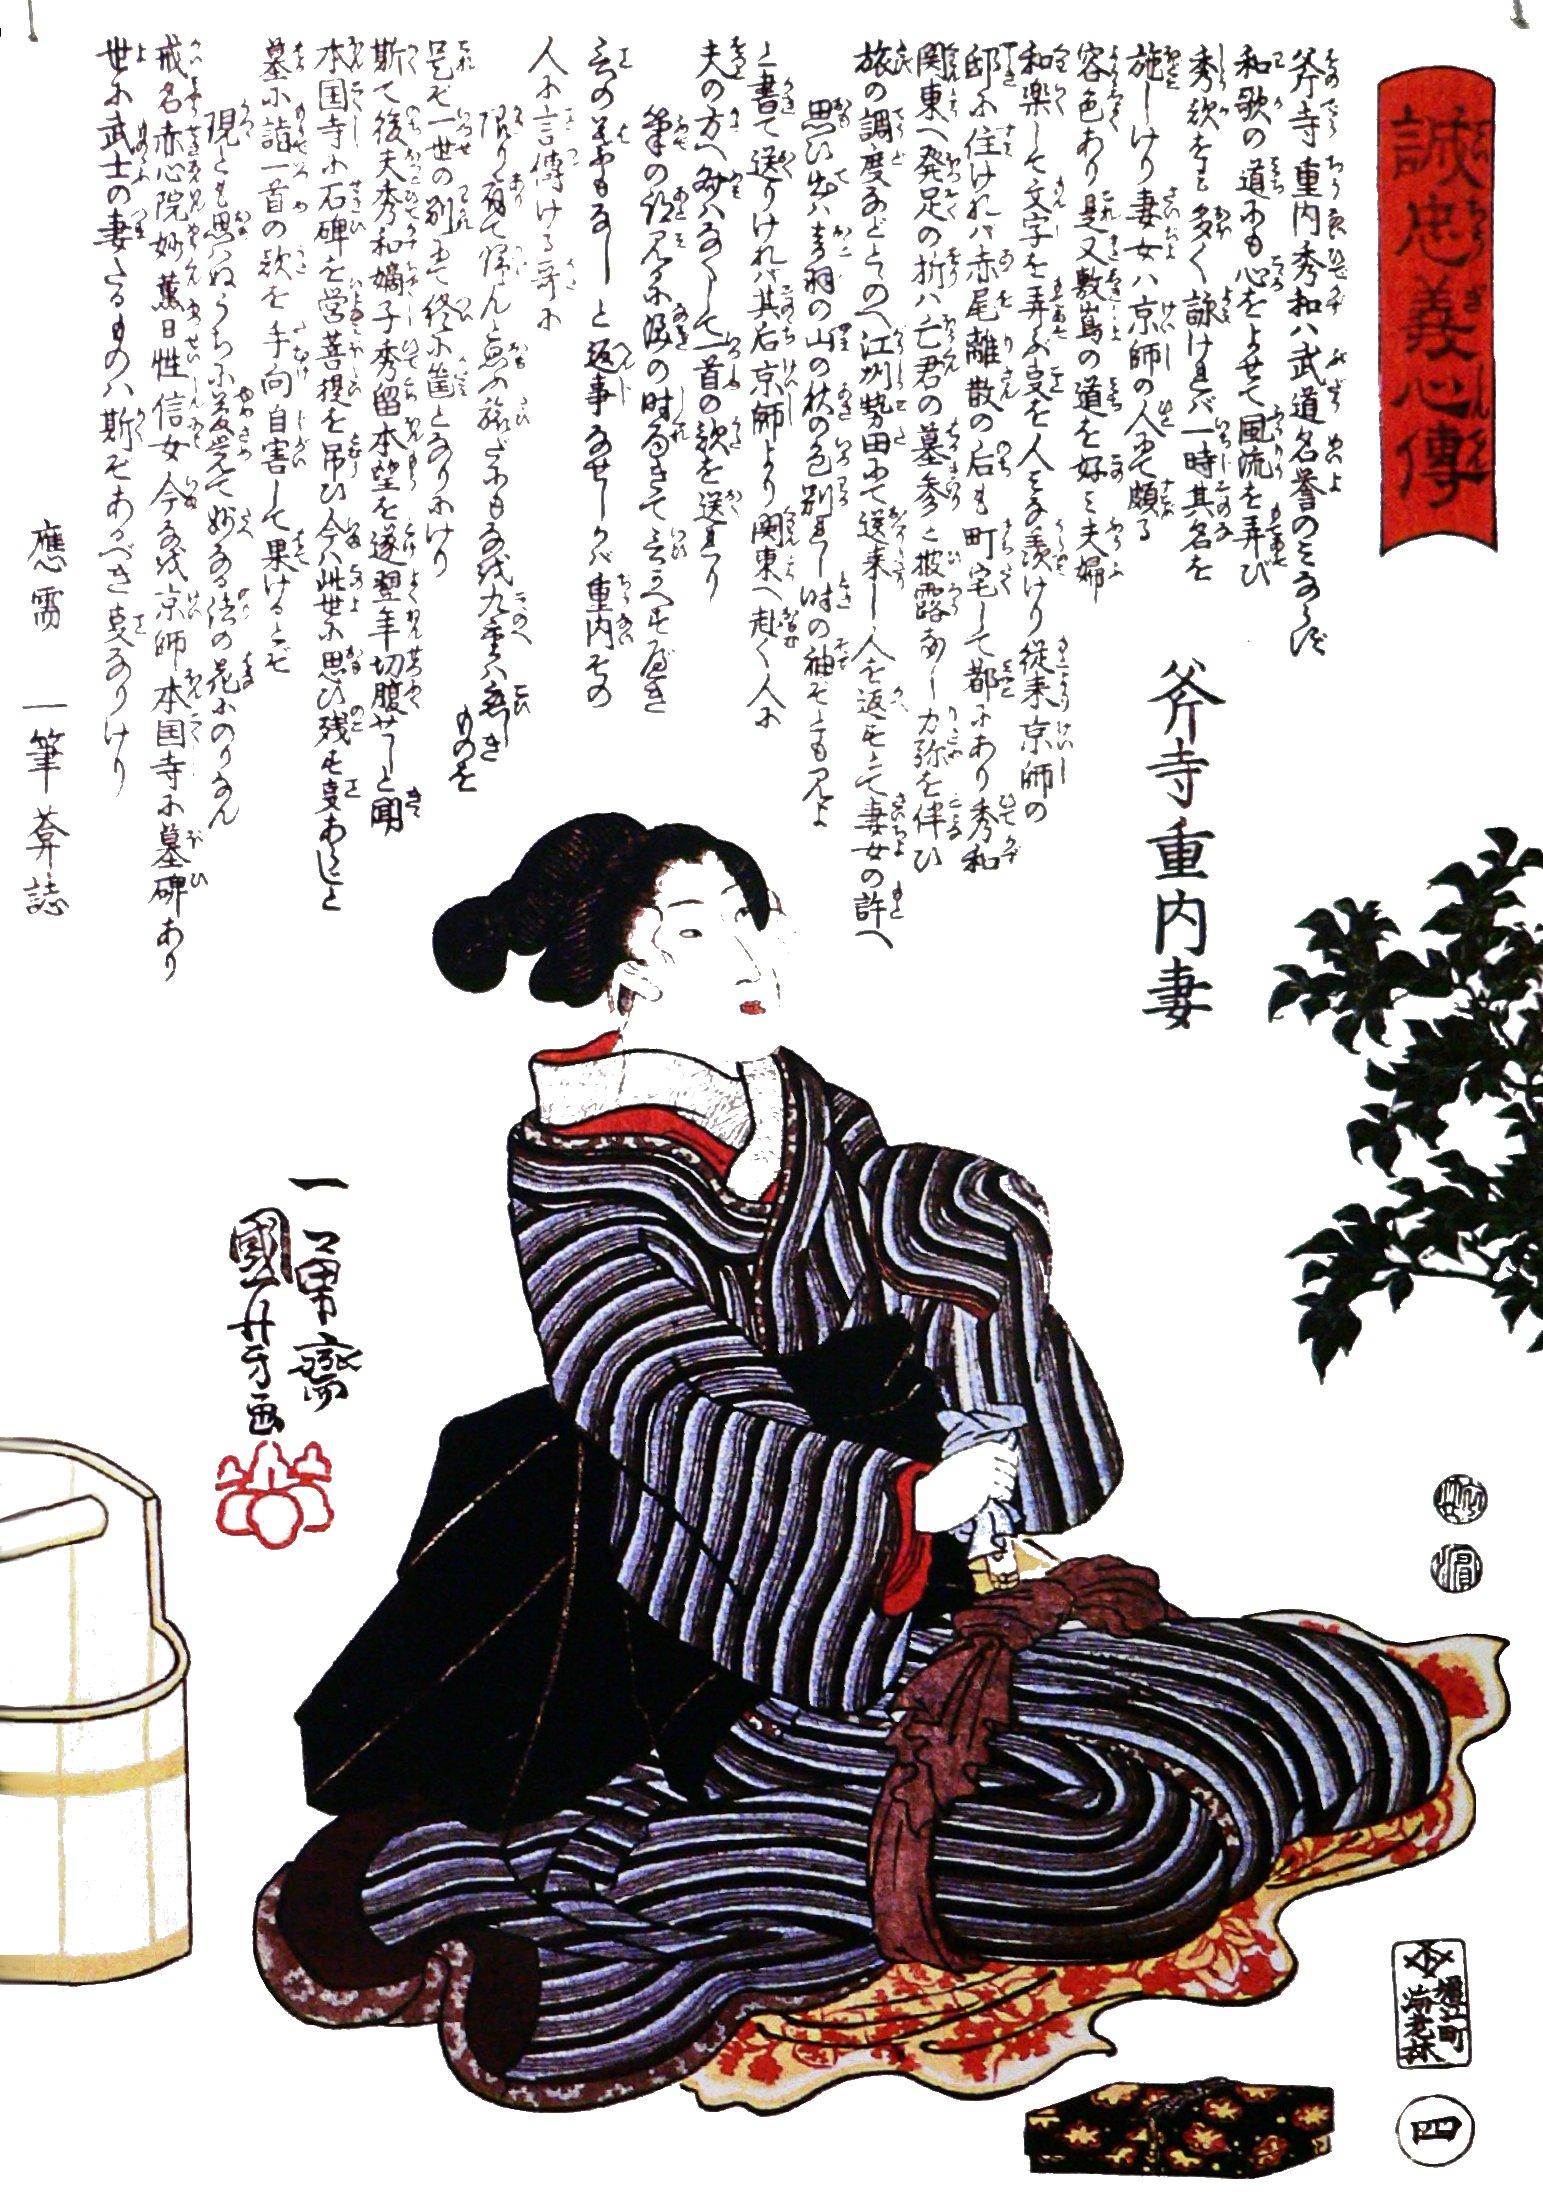 Drawn samurai harakiri Seppuku Wikiwand